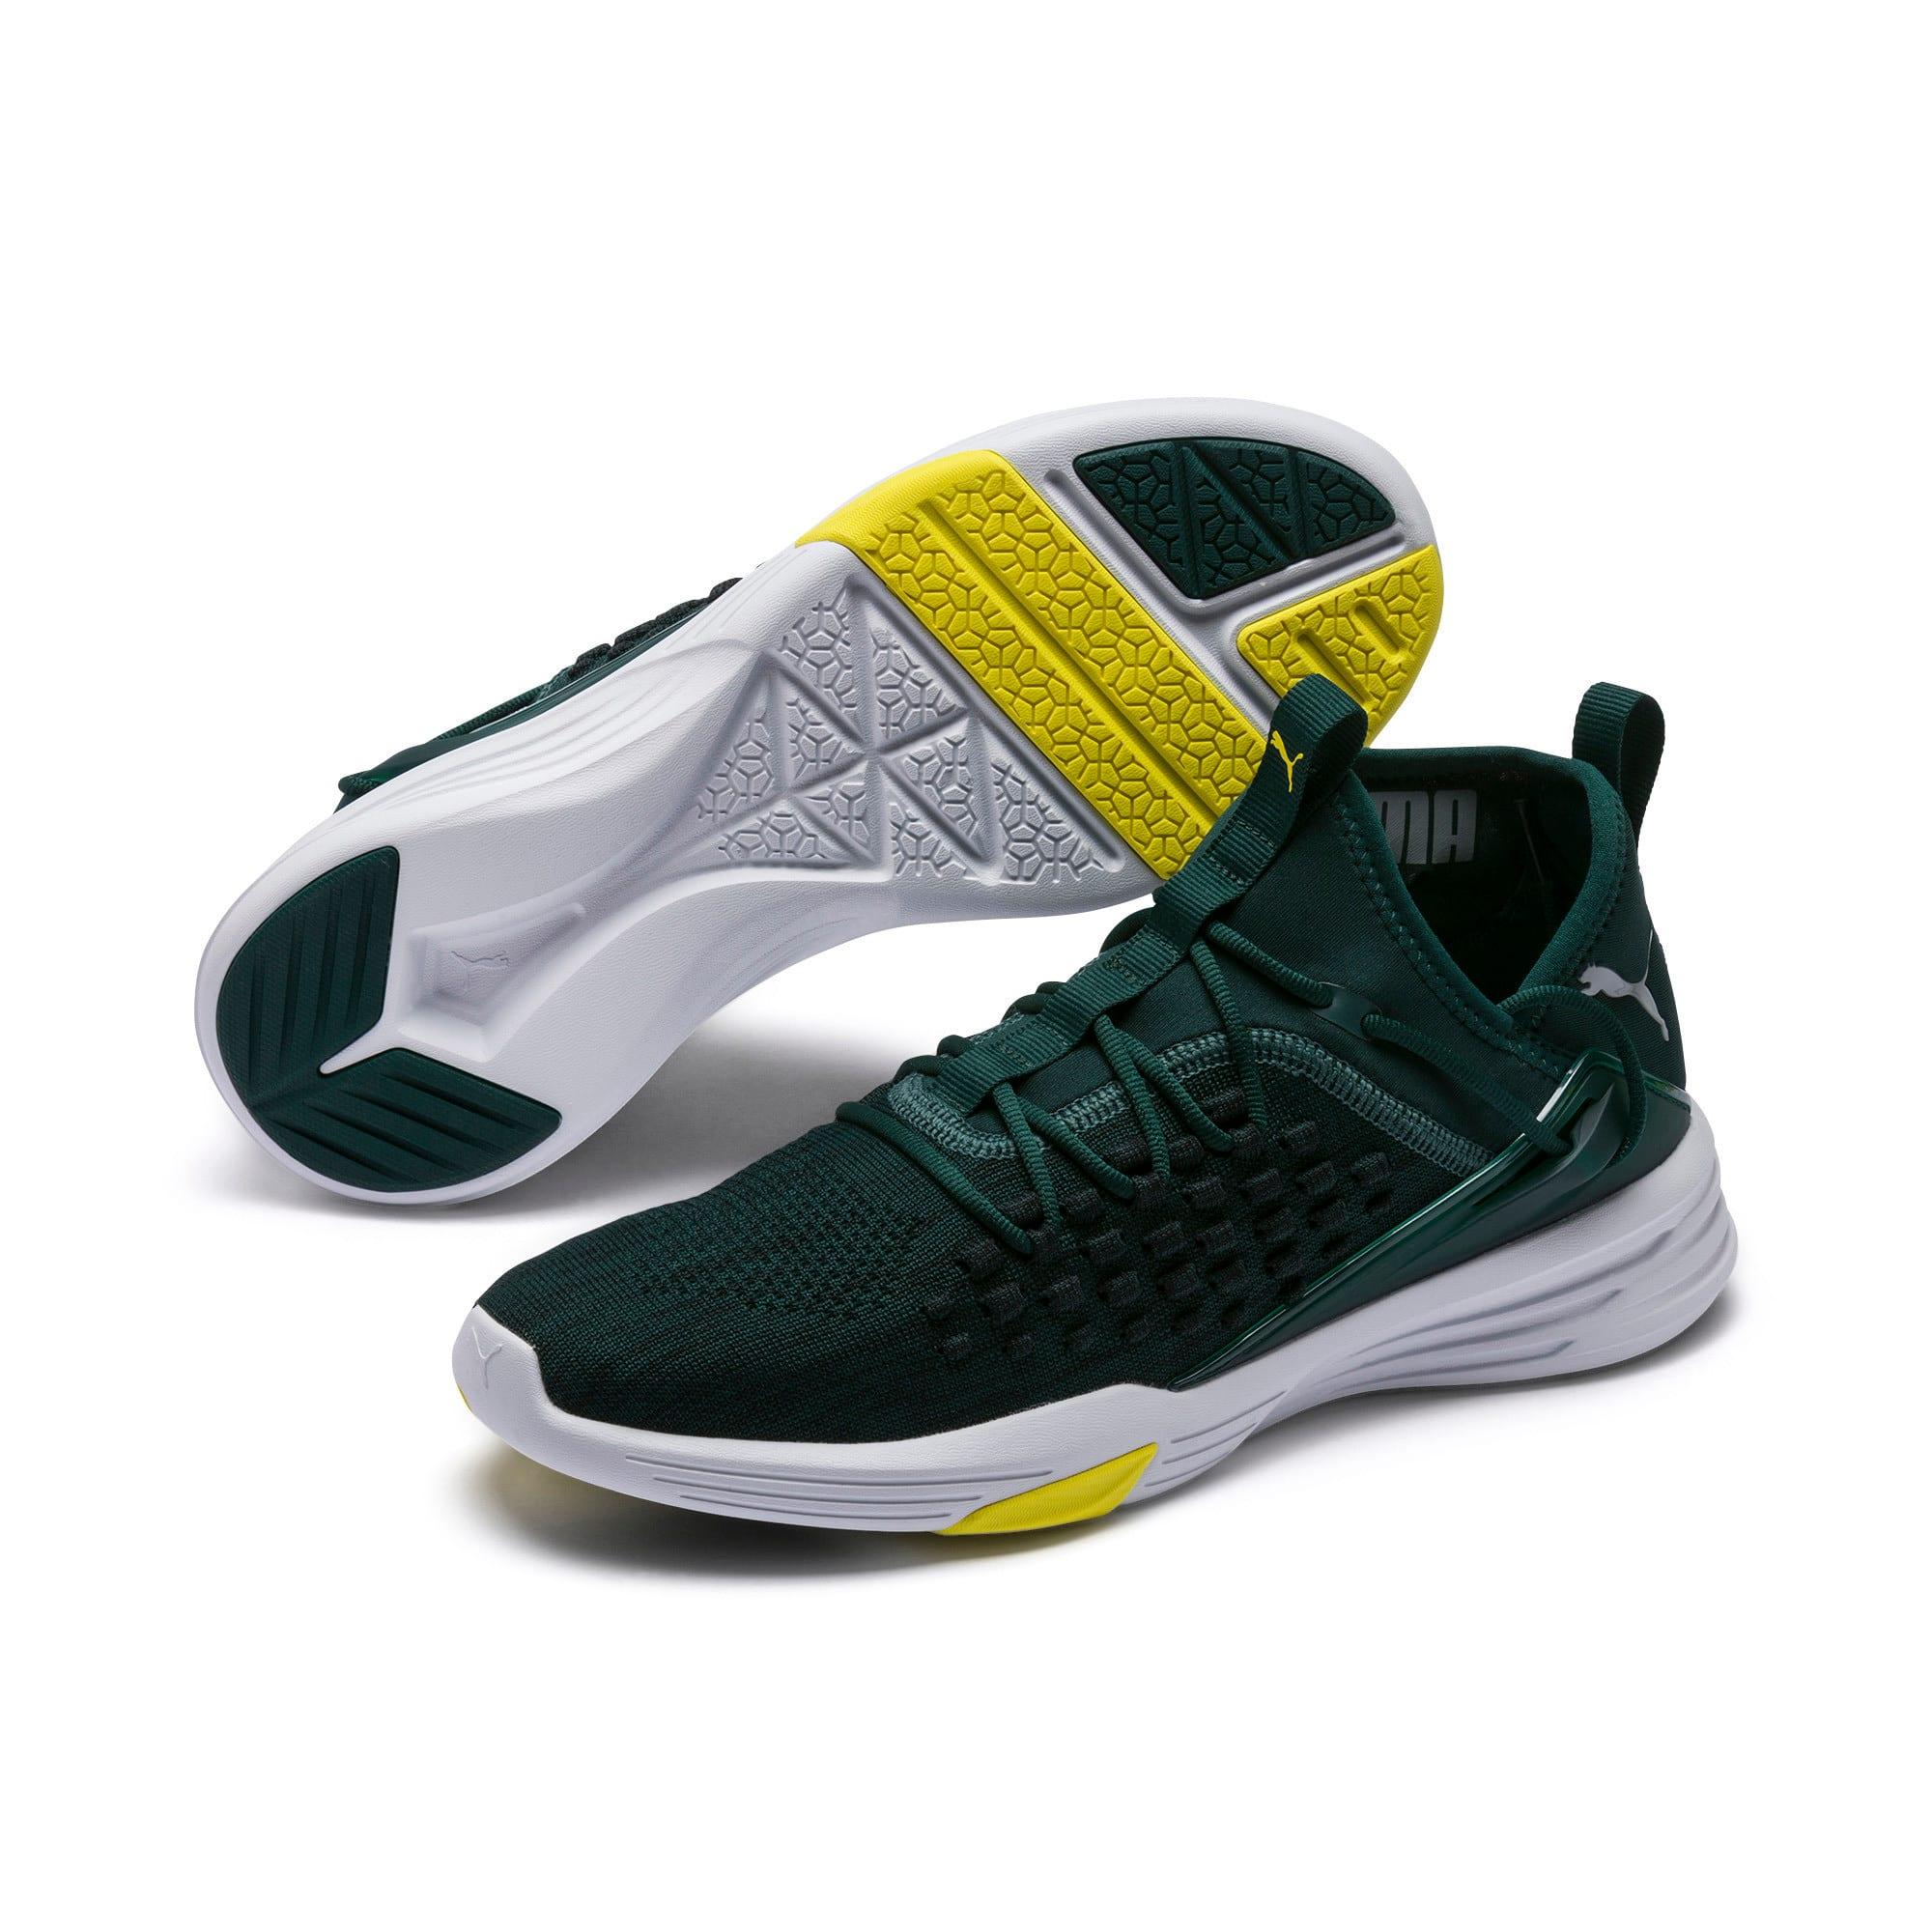 Thumbnail 3 of Mantra Men's Training Shoe, Ponderosa Pine-Puma White, medium